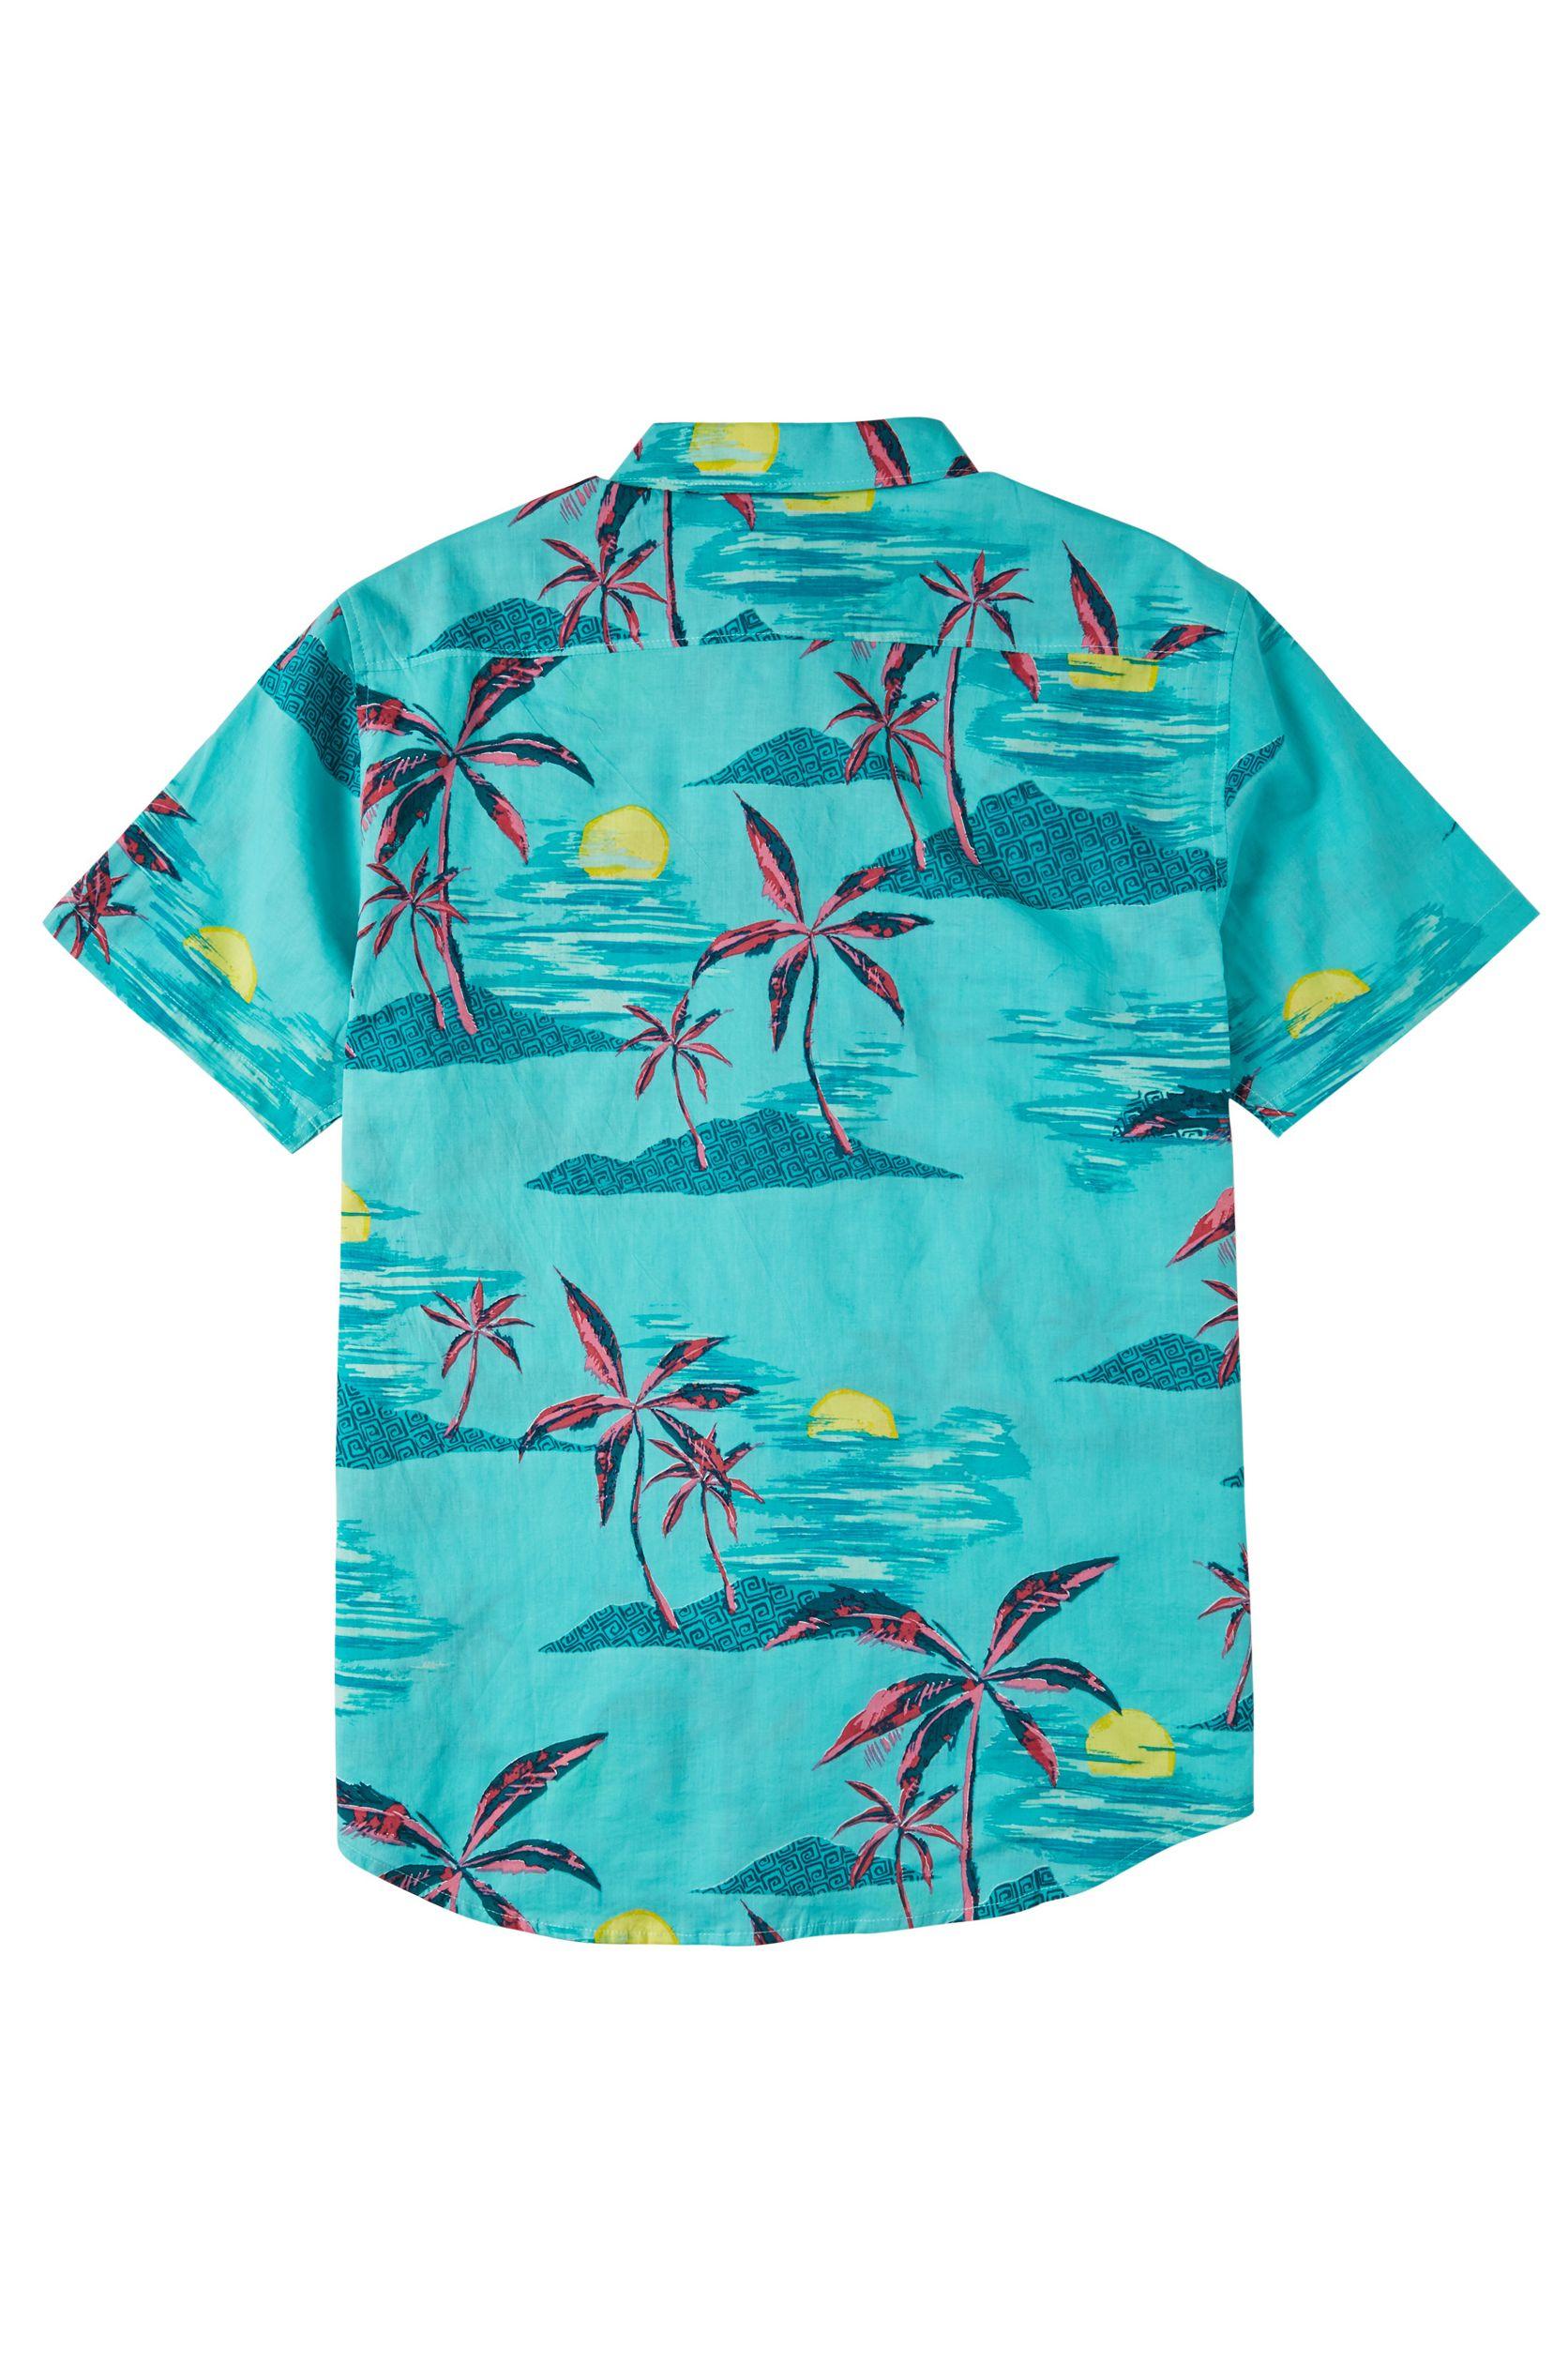 Camisa Billabong SUNDAYS FLORAL SS Mint